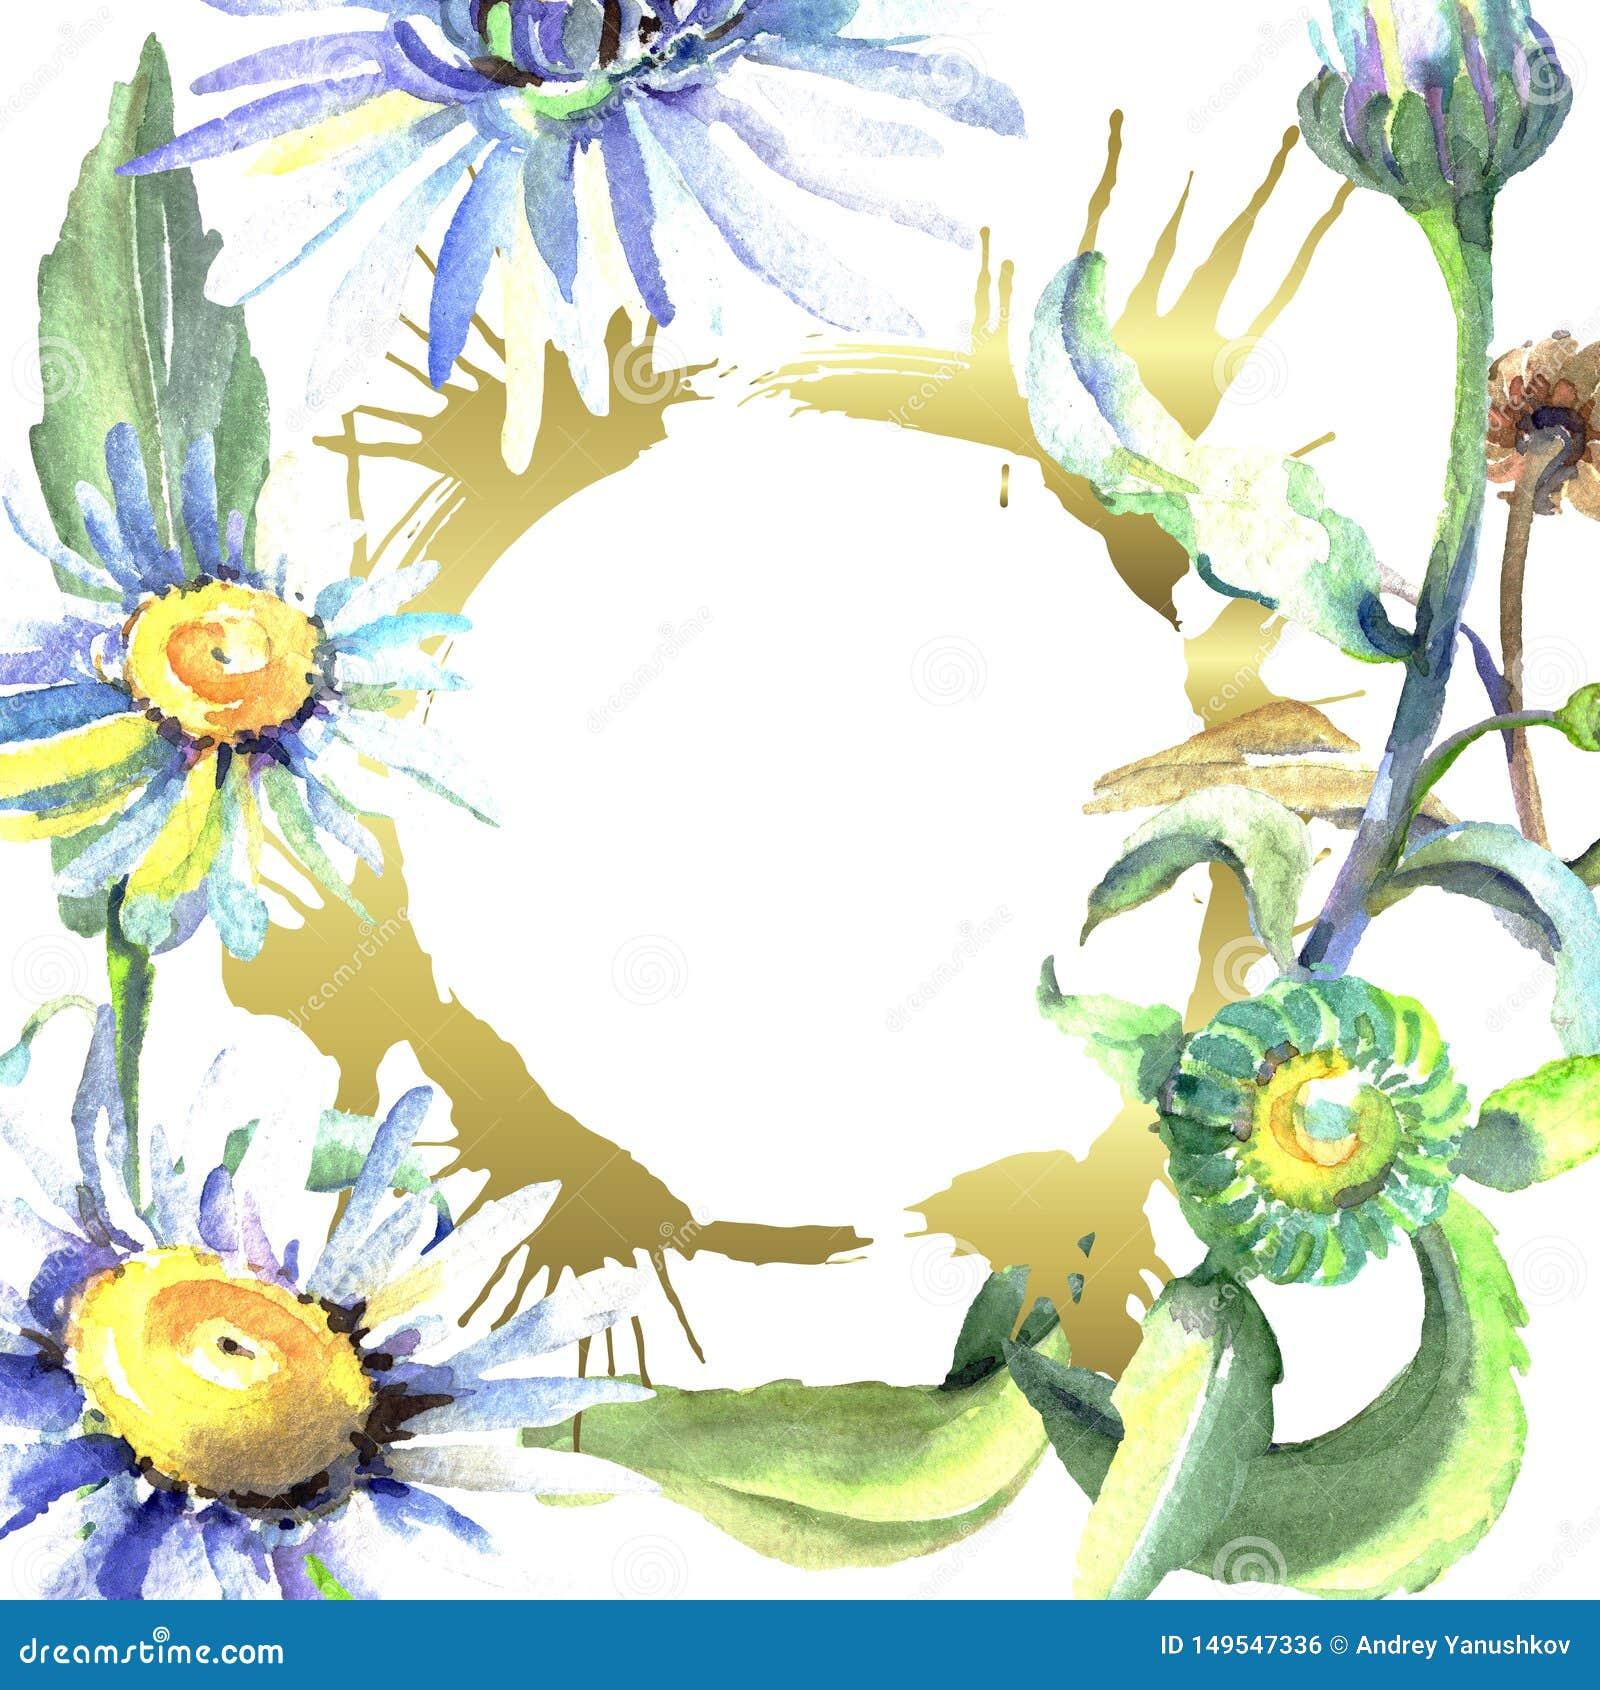 White daisy floral botanical flowers. Watercolor background illustration set. Frame border ornament square.